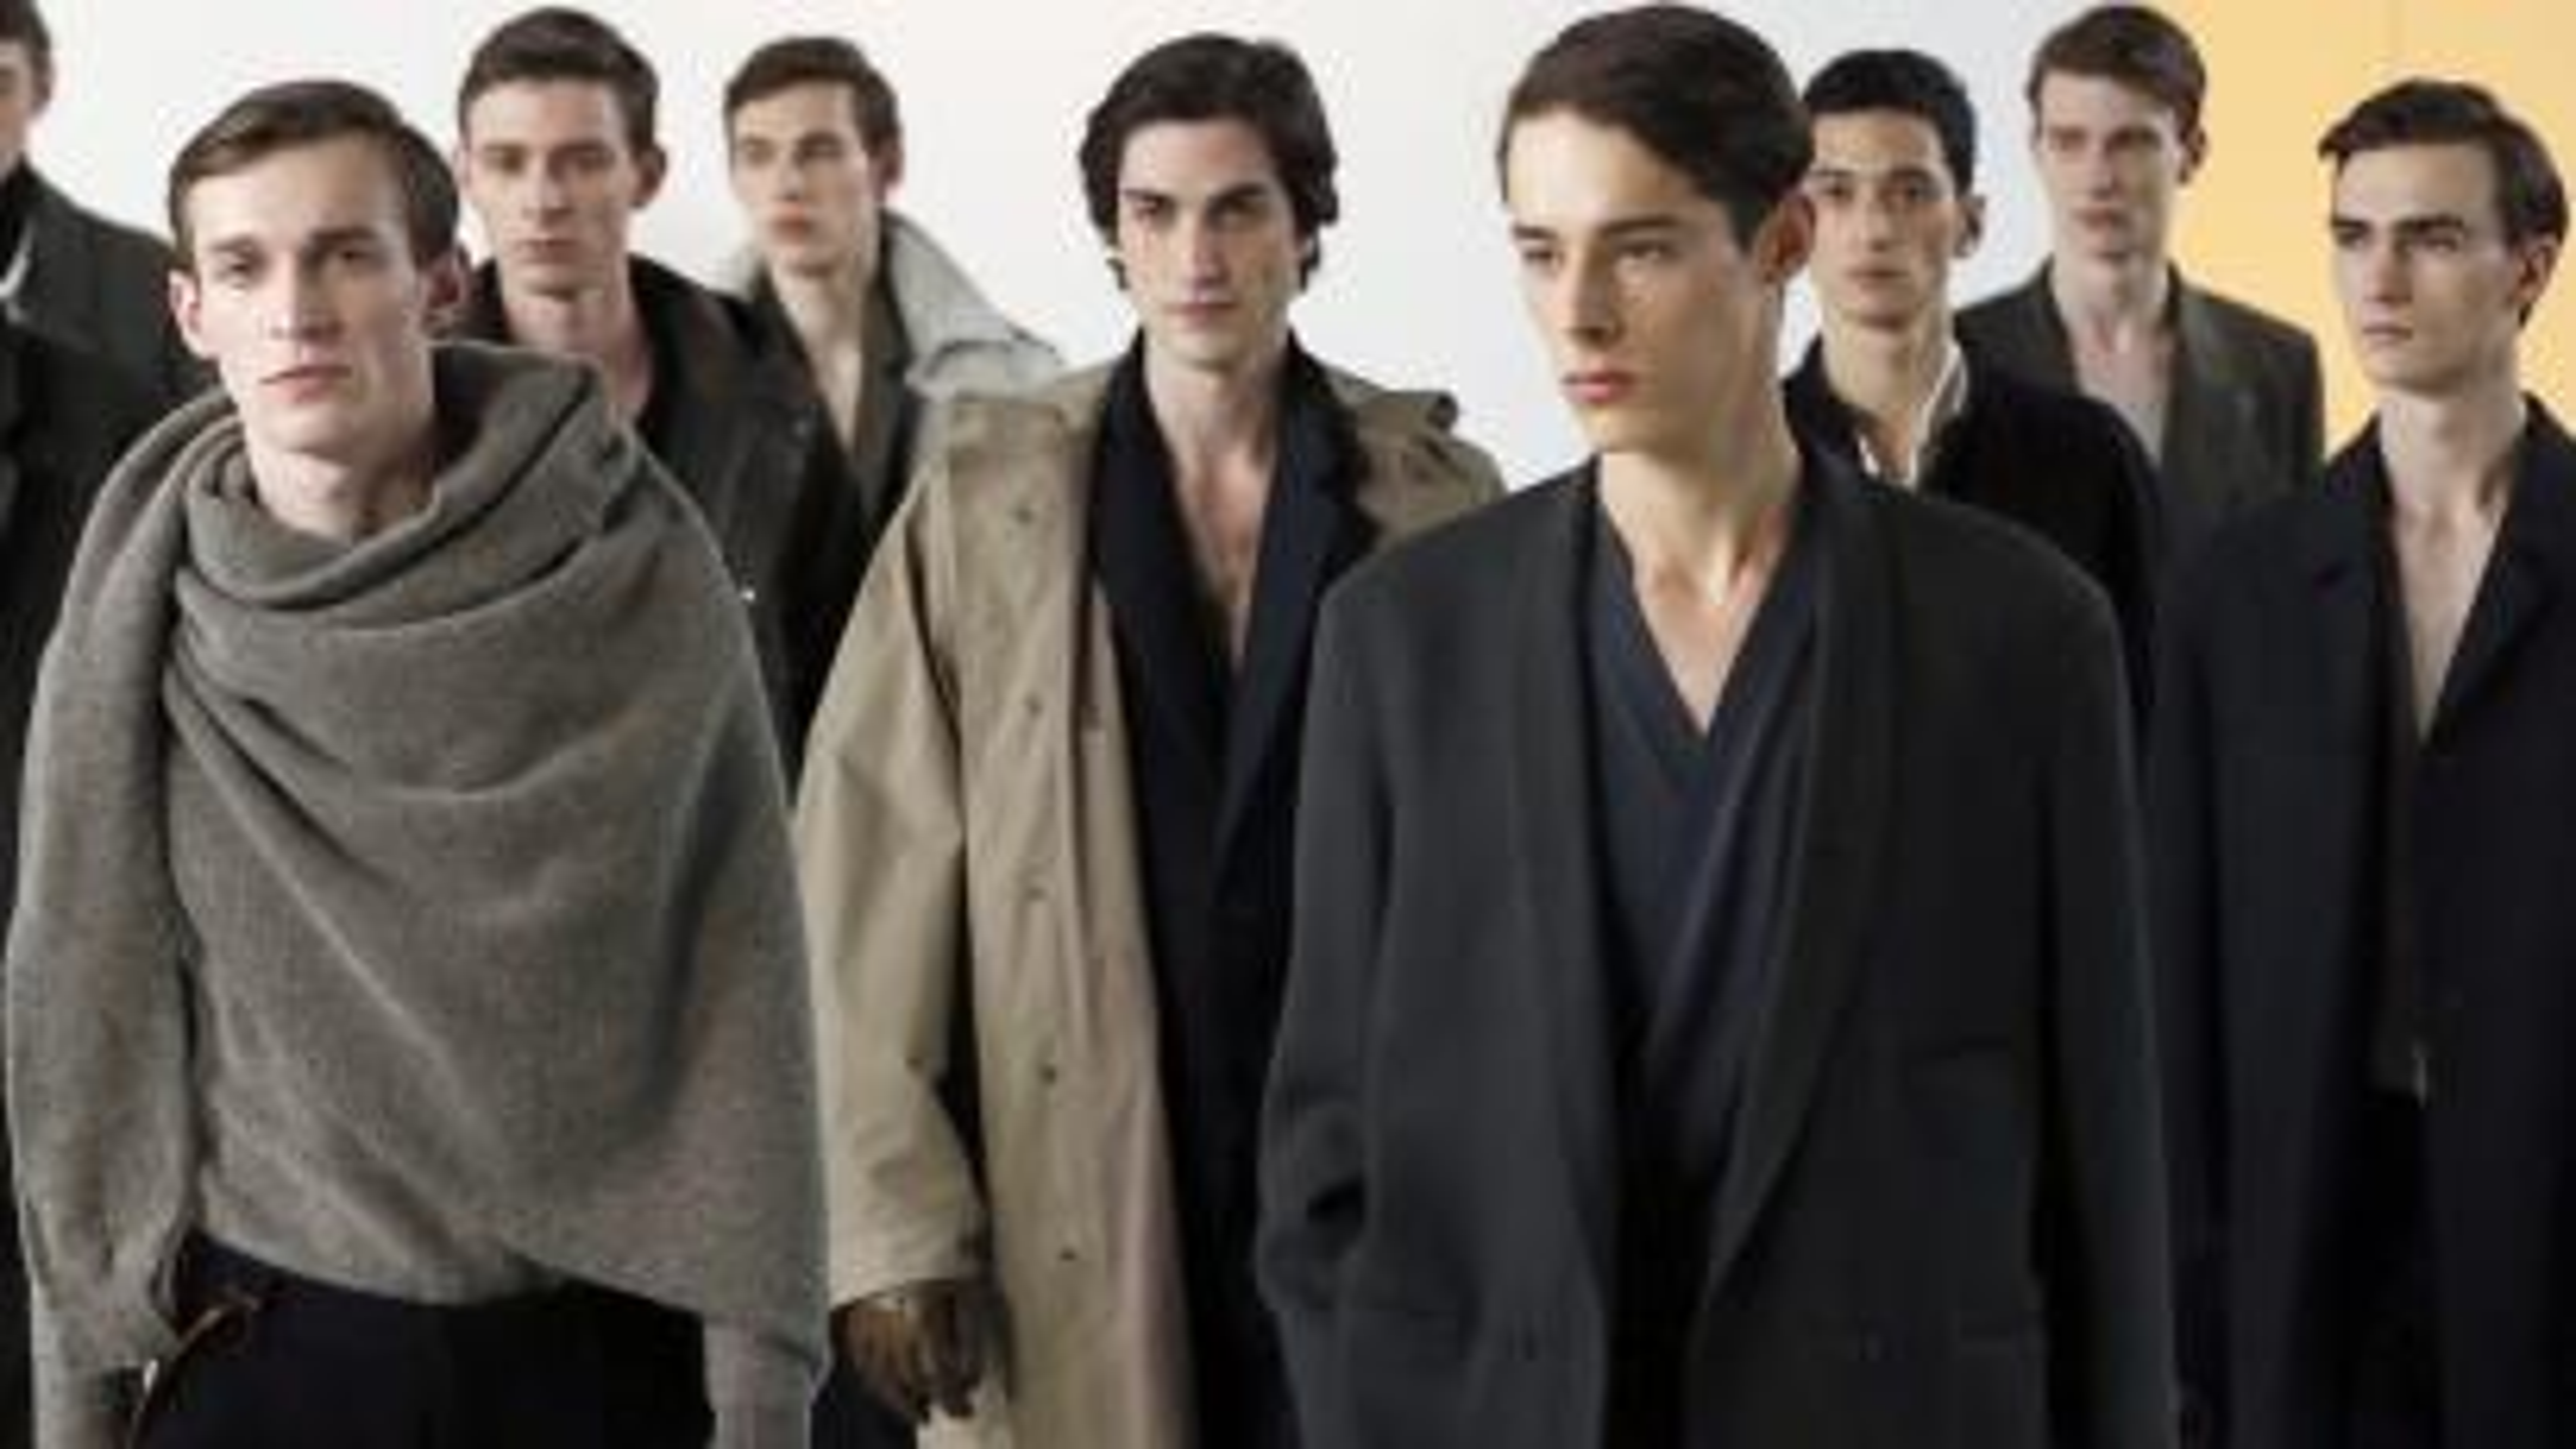 lemaire, fashion, style, lifestyle, menswear, fall 2015, paris fashion week